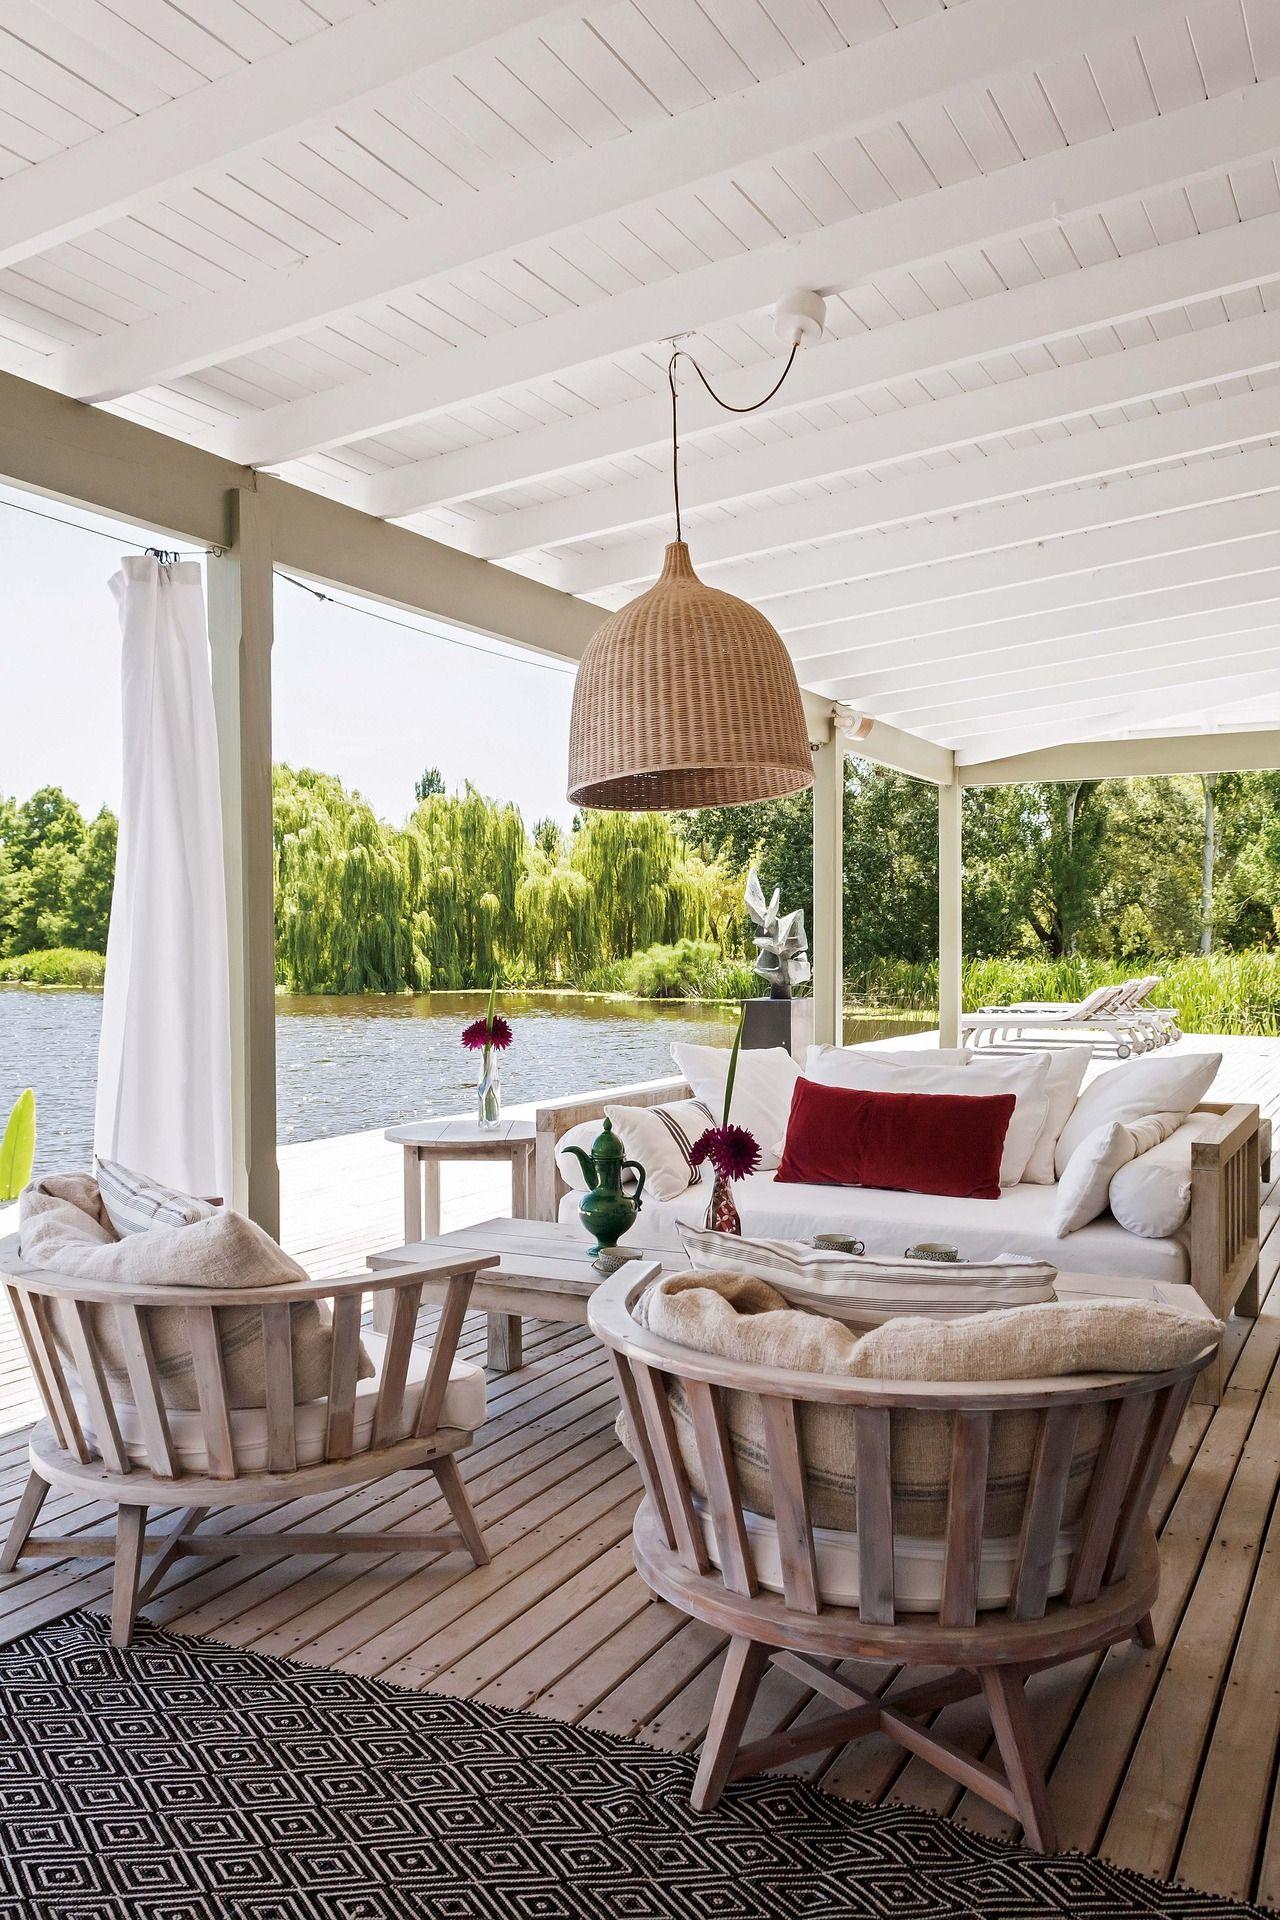 Una casa con un jardín espectacular | Sillon blanco, Casa de fin de ...